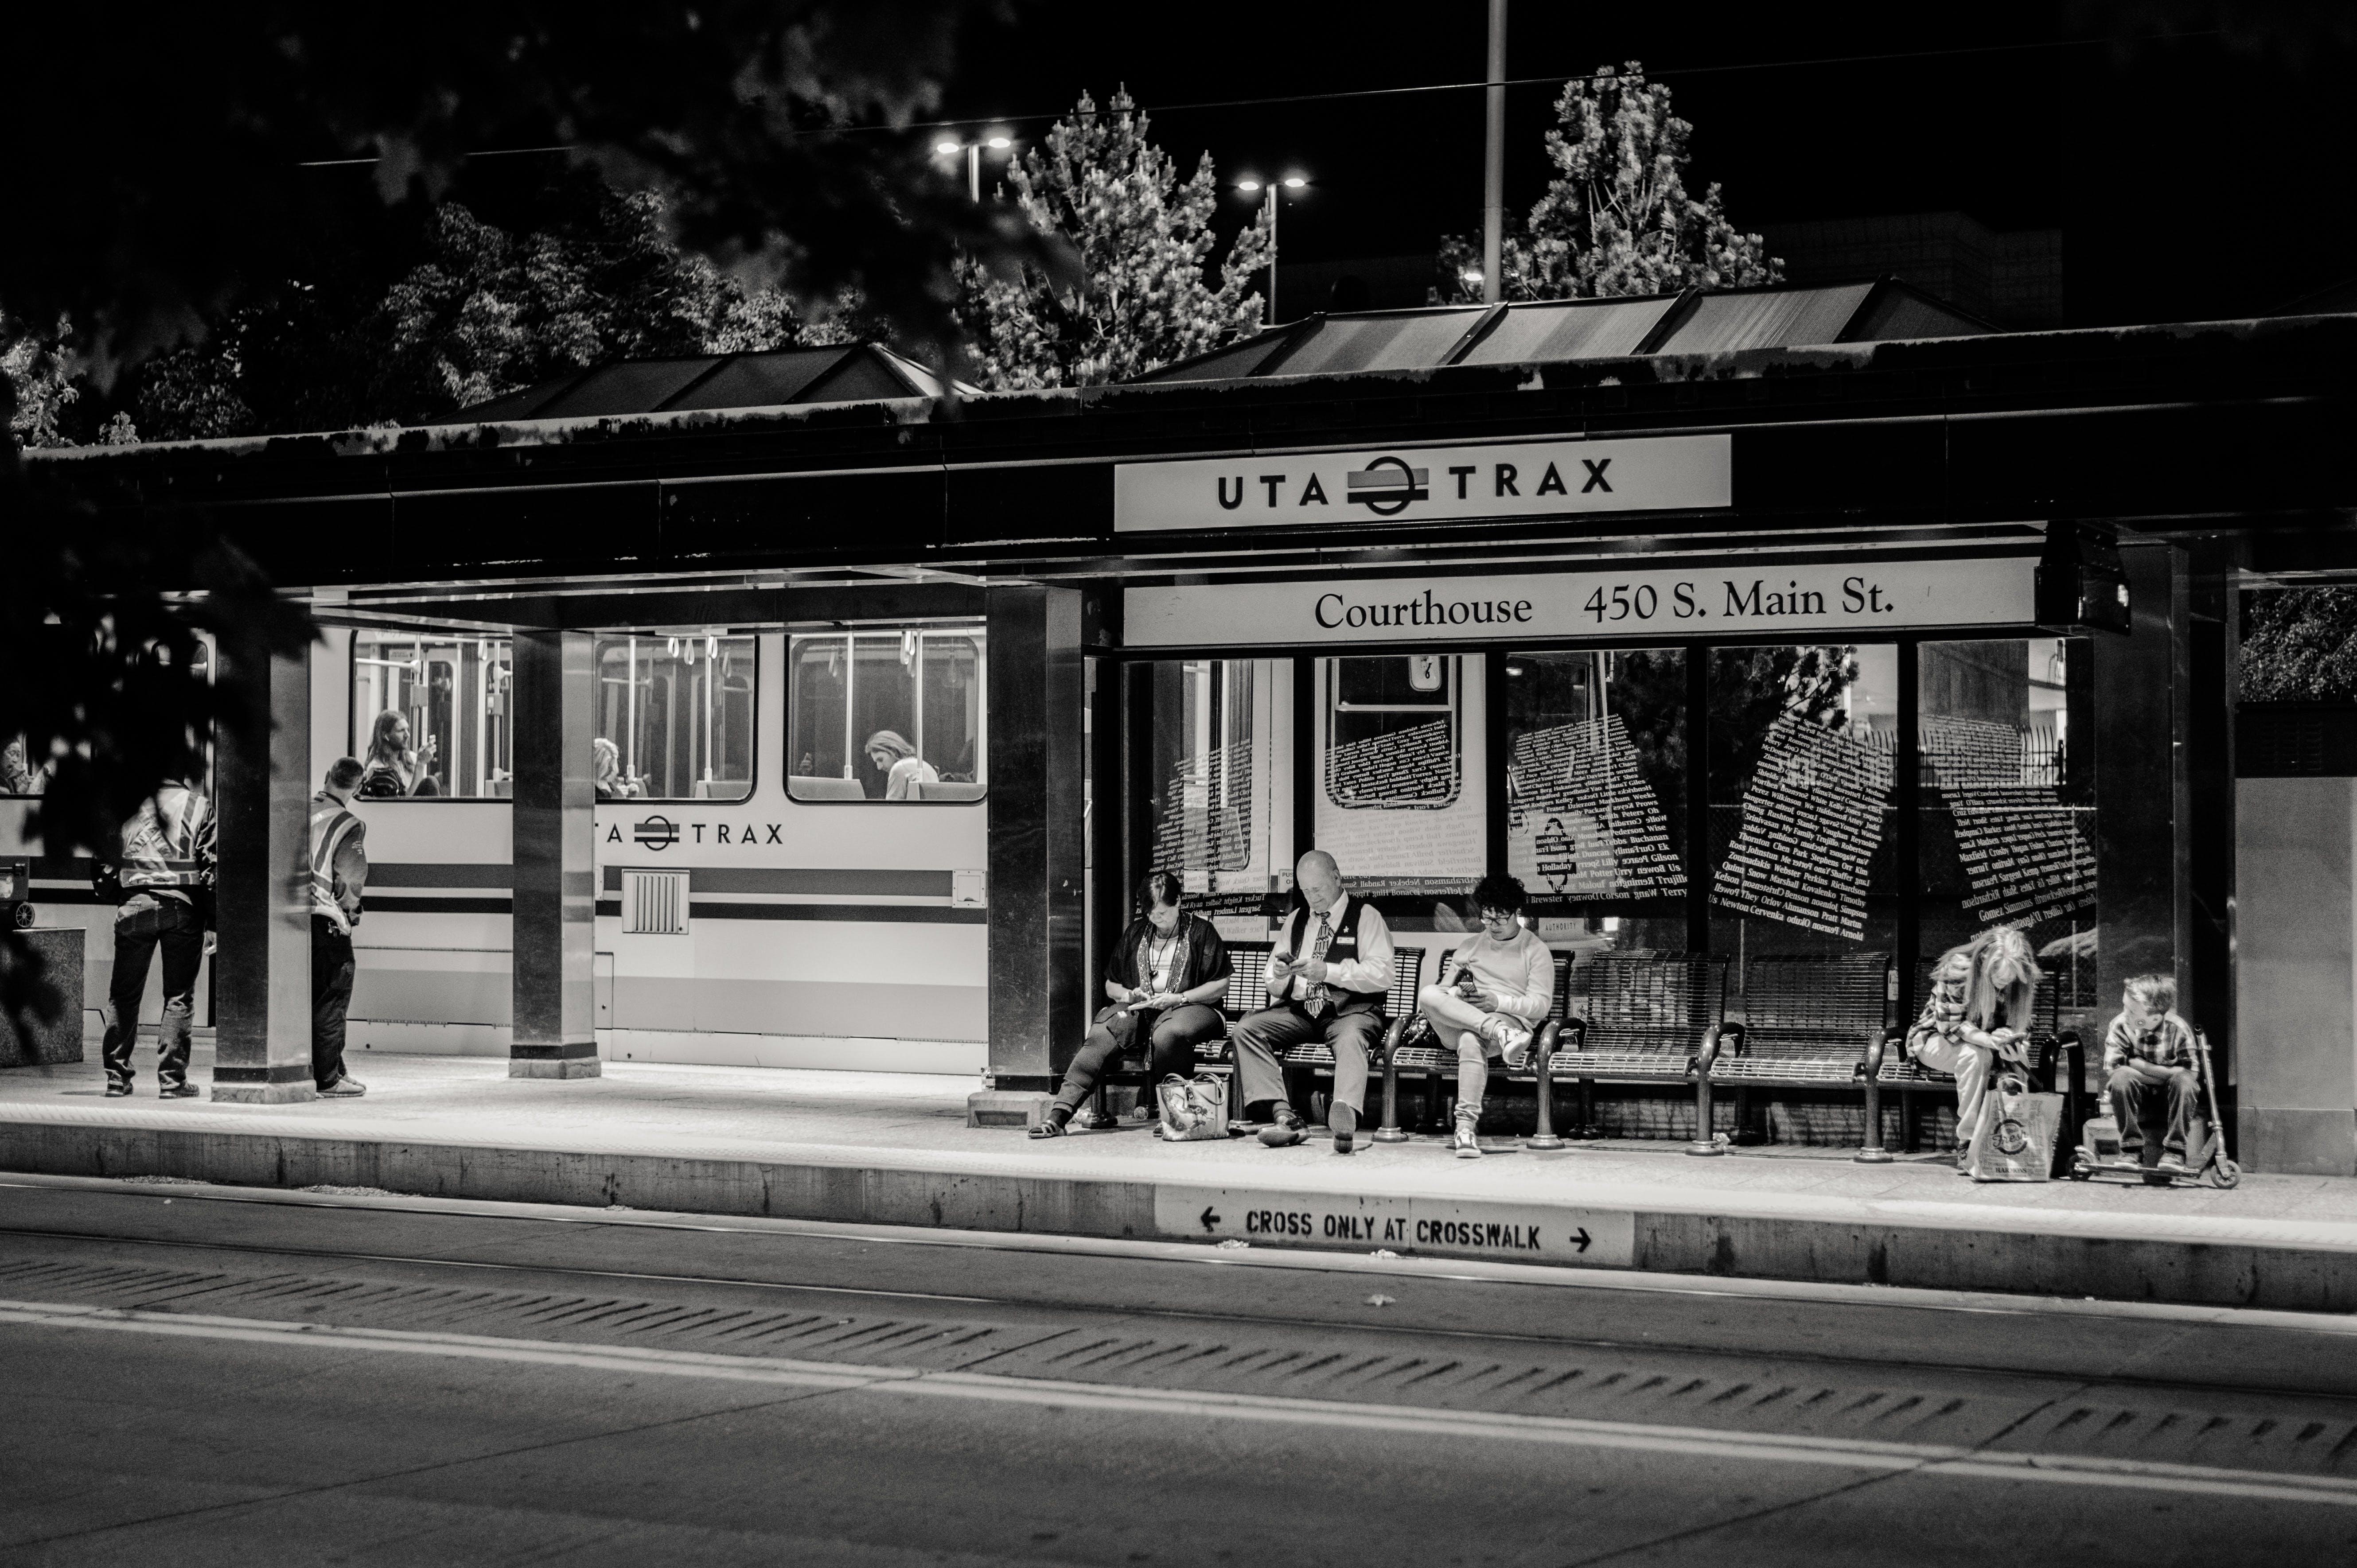 Foto stok gratis fotografi monokrom, jalur trem, kereta listrik, manusia